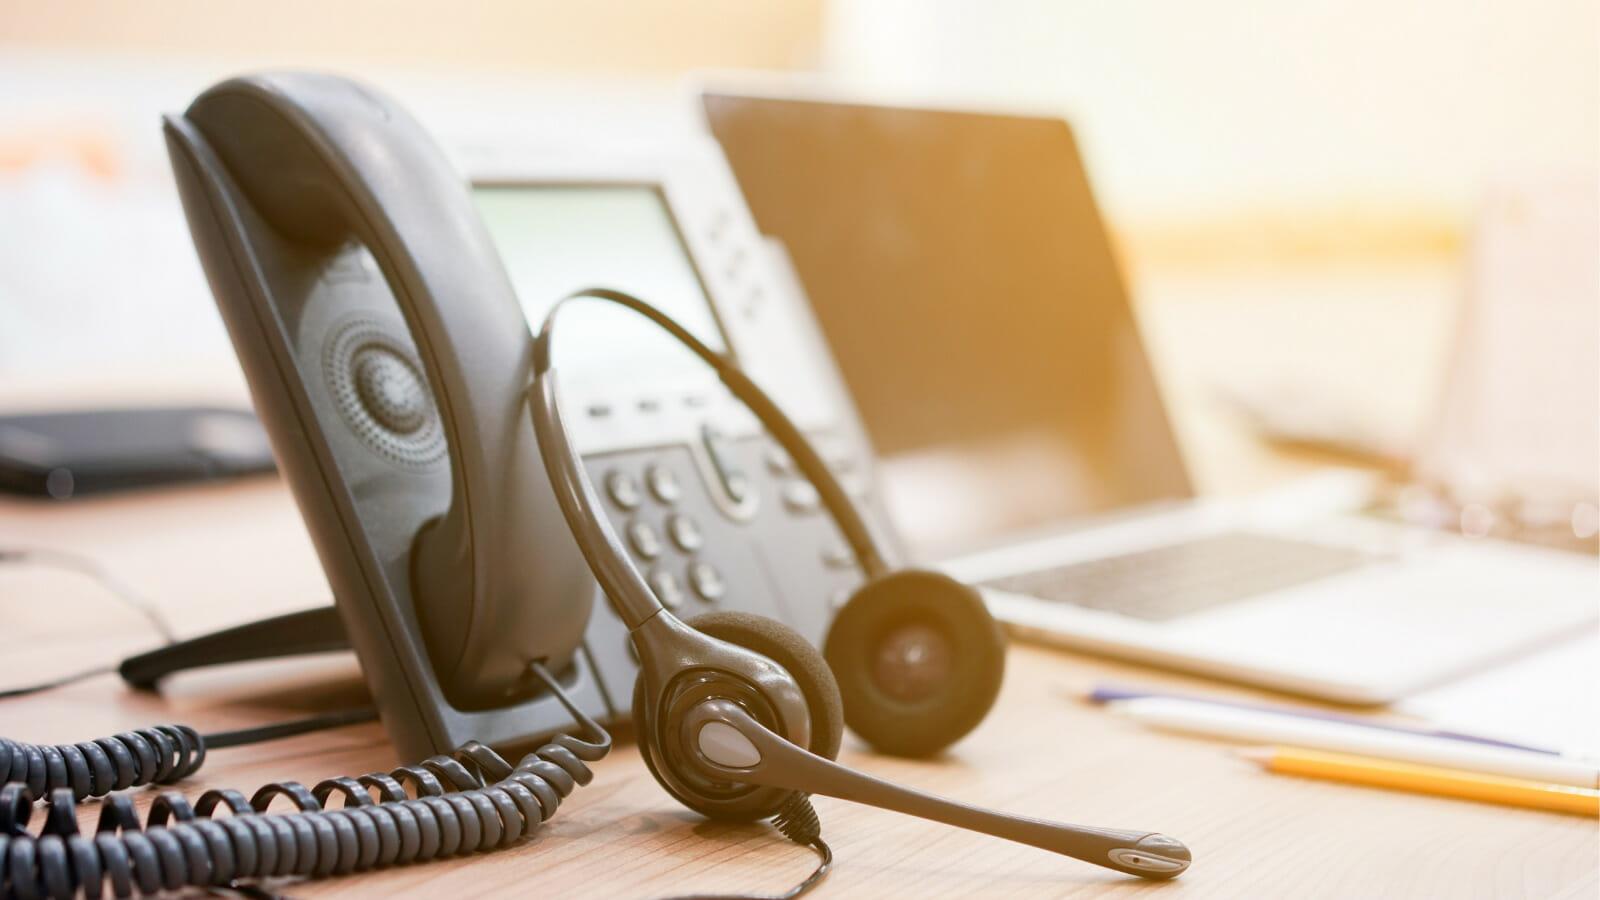 softphone vs. deskphone